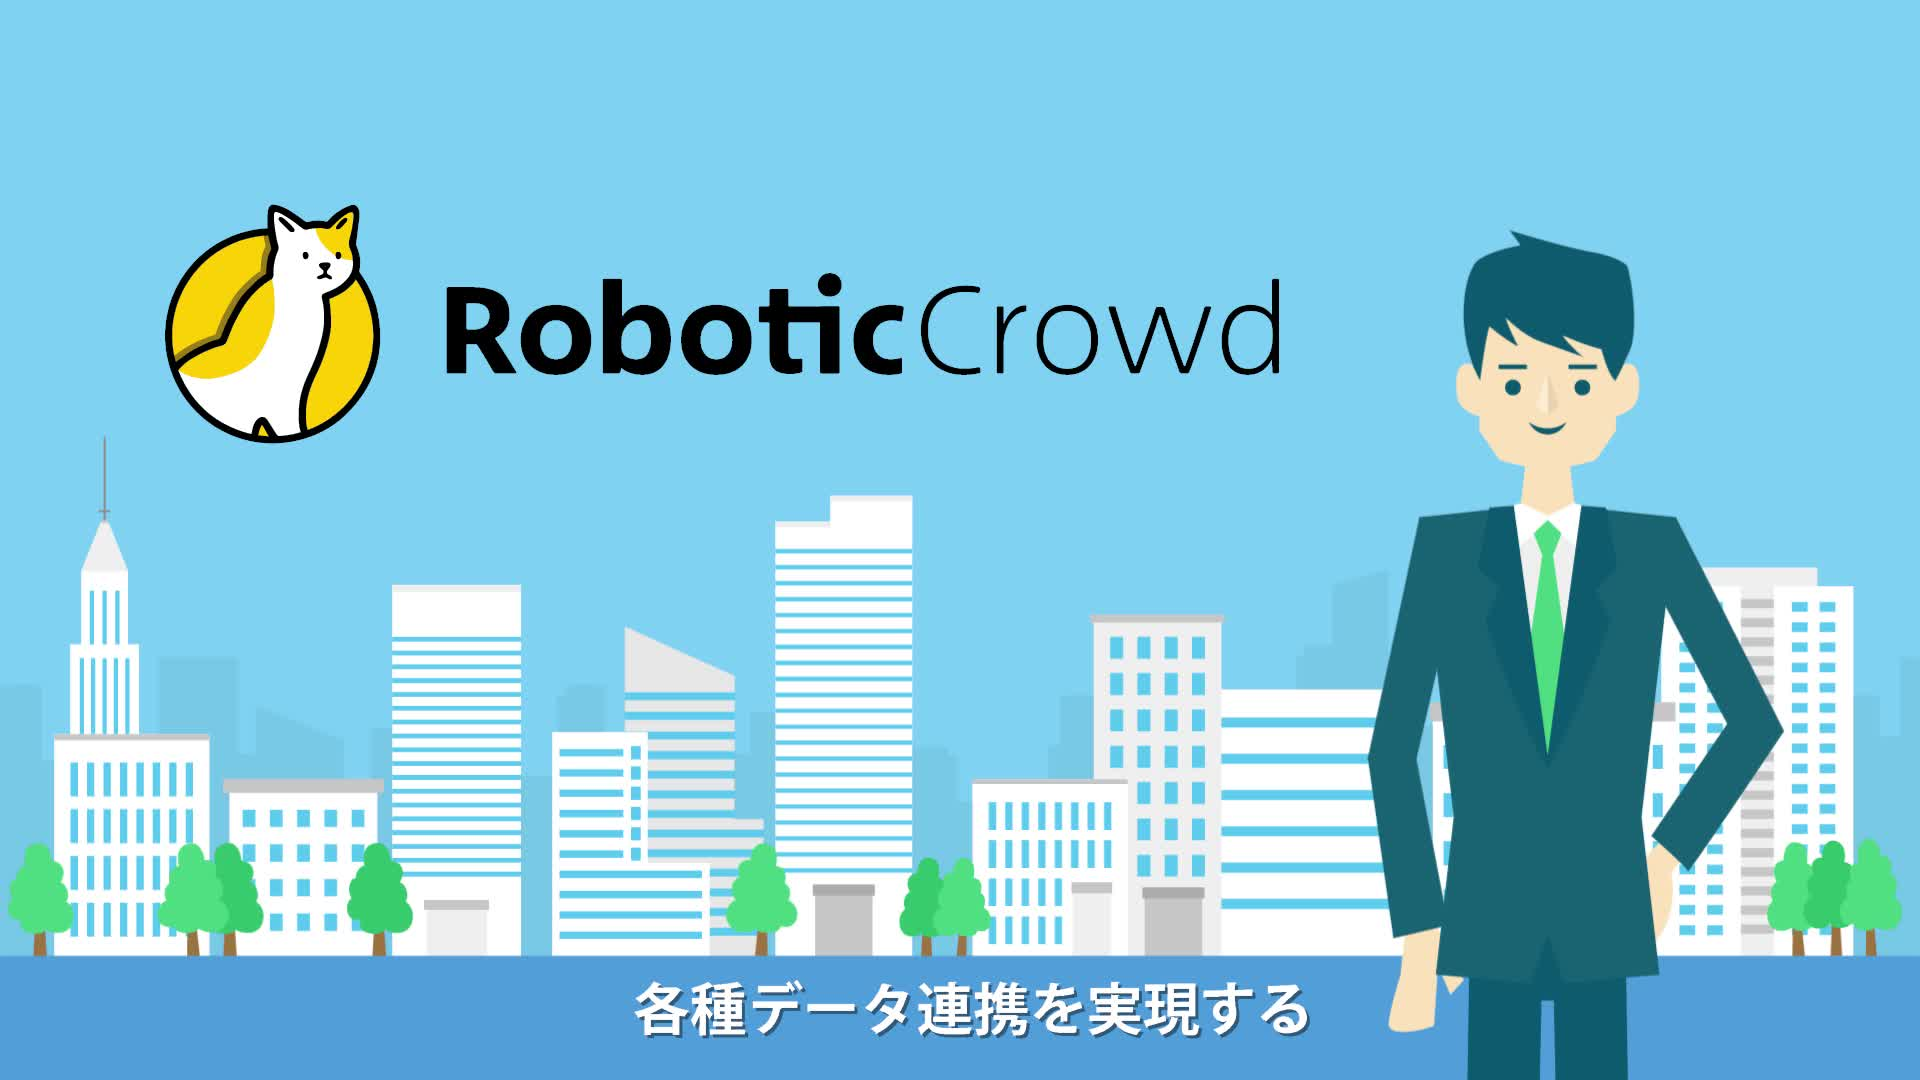 RoboticCrowd